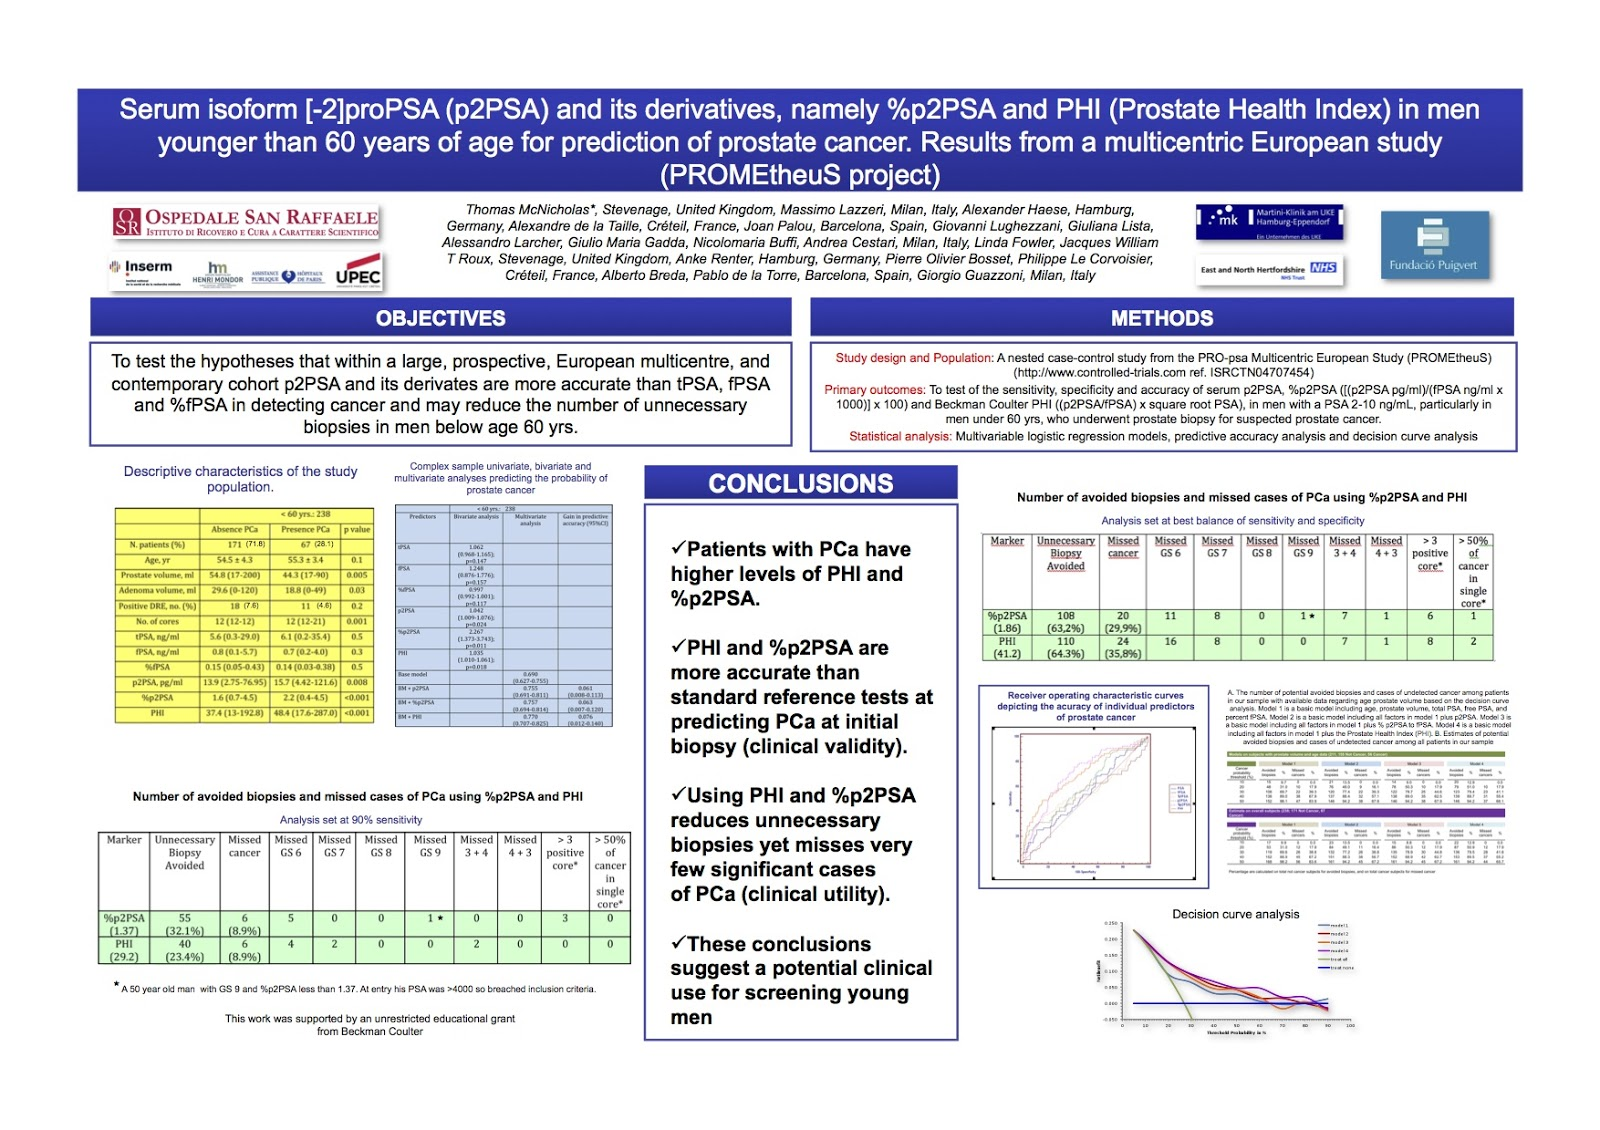 Avodart and psa results